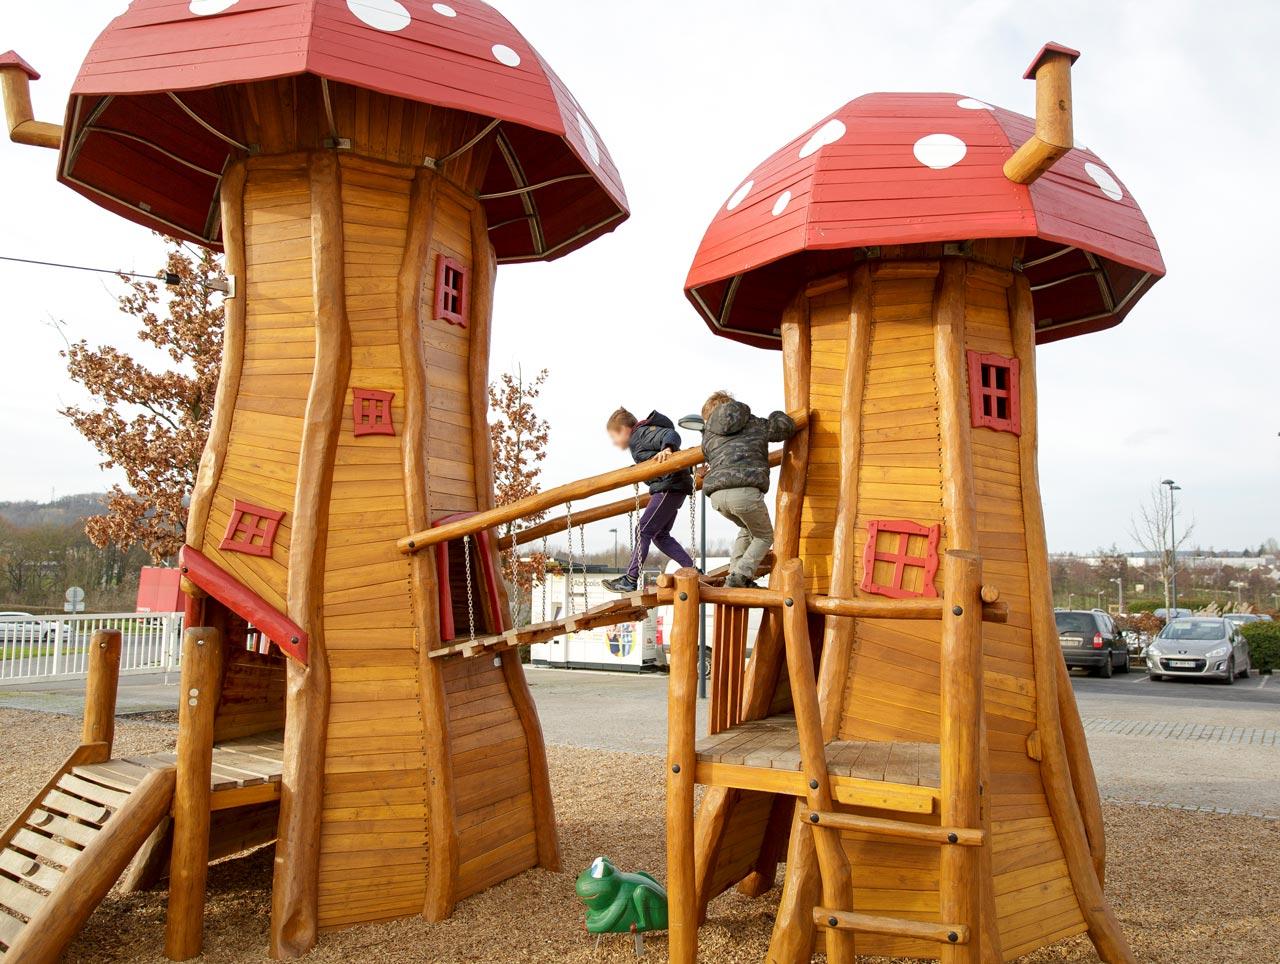 Themenspielplatz mit Fliegenpilzen, Soissons, Parc des Moulins, Frankreich